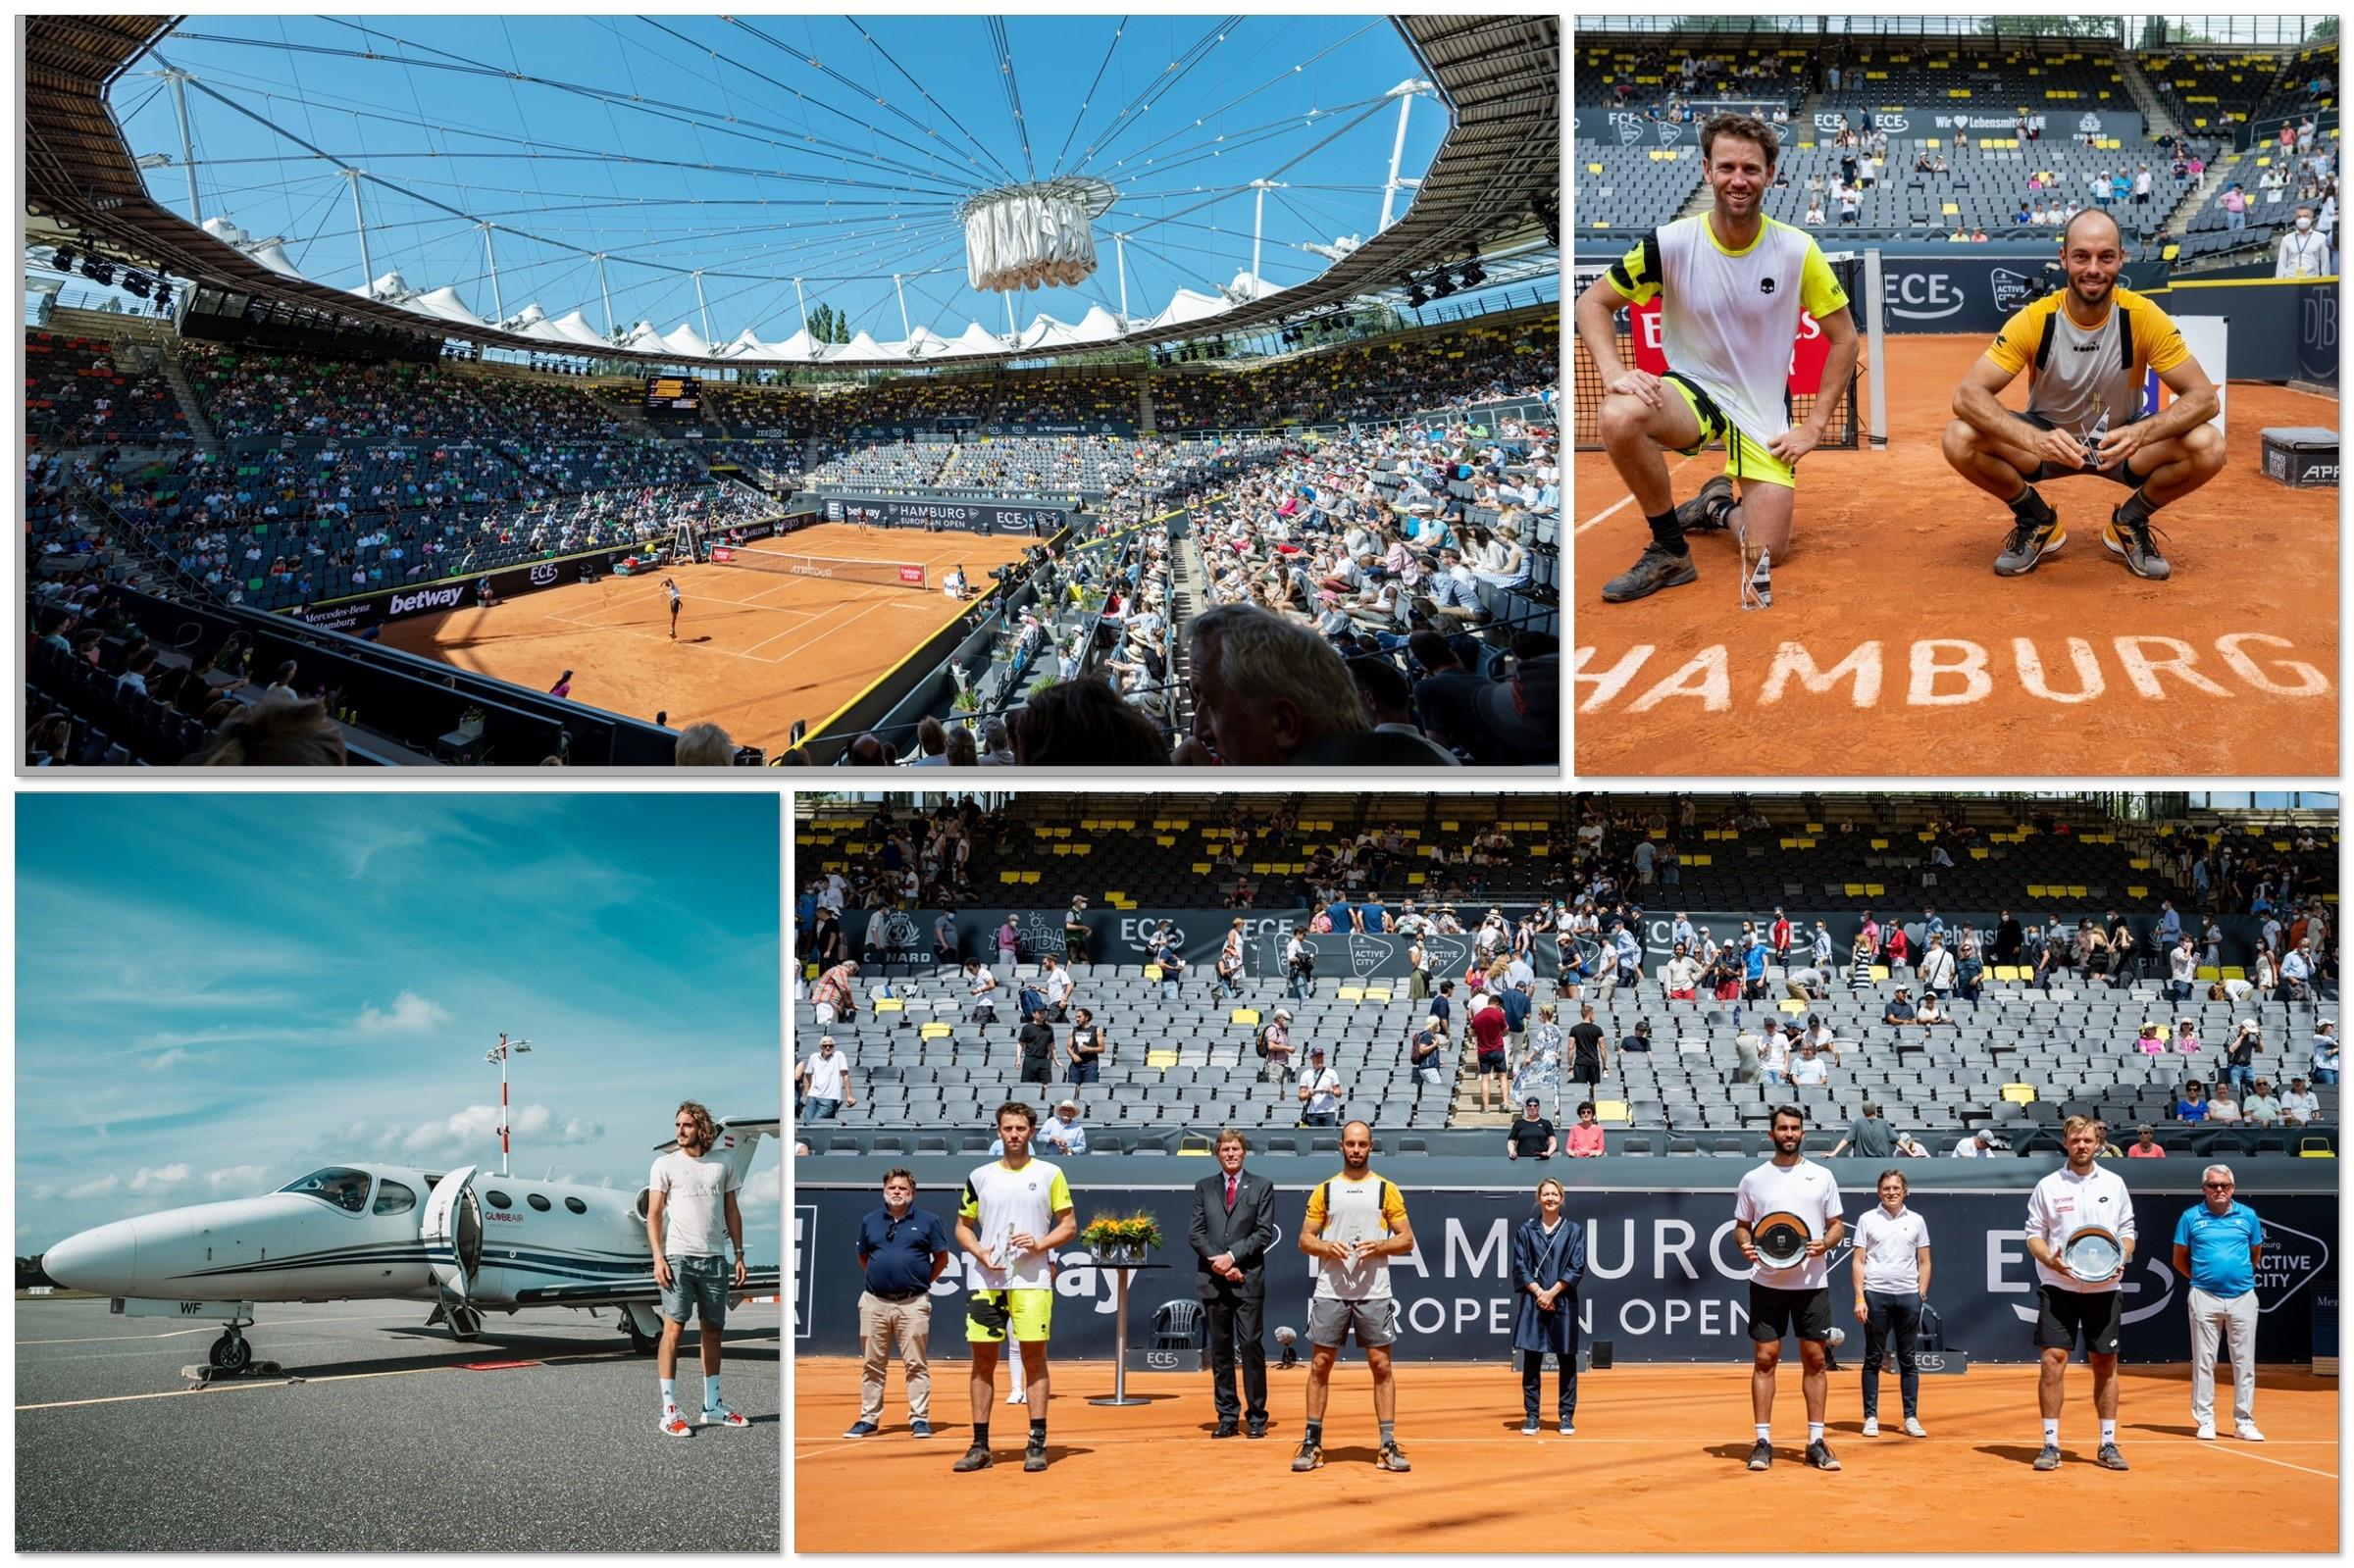 Pablo Carreño Busta gewinnt Hamburg European Open